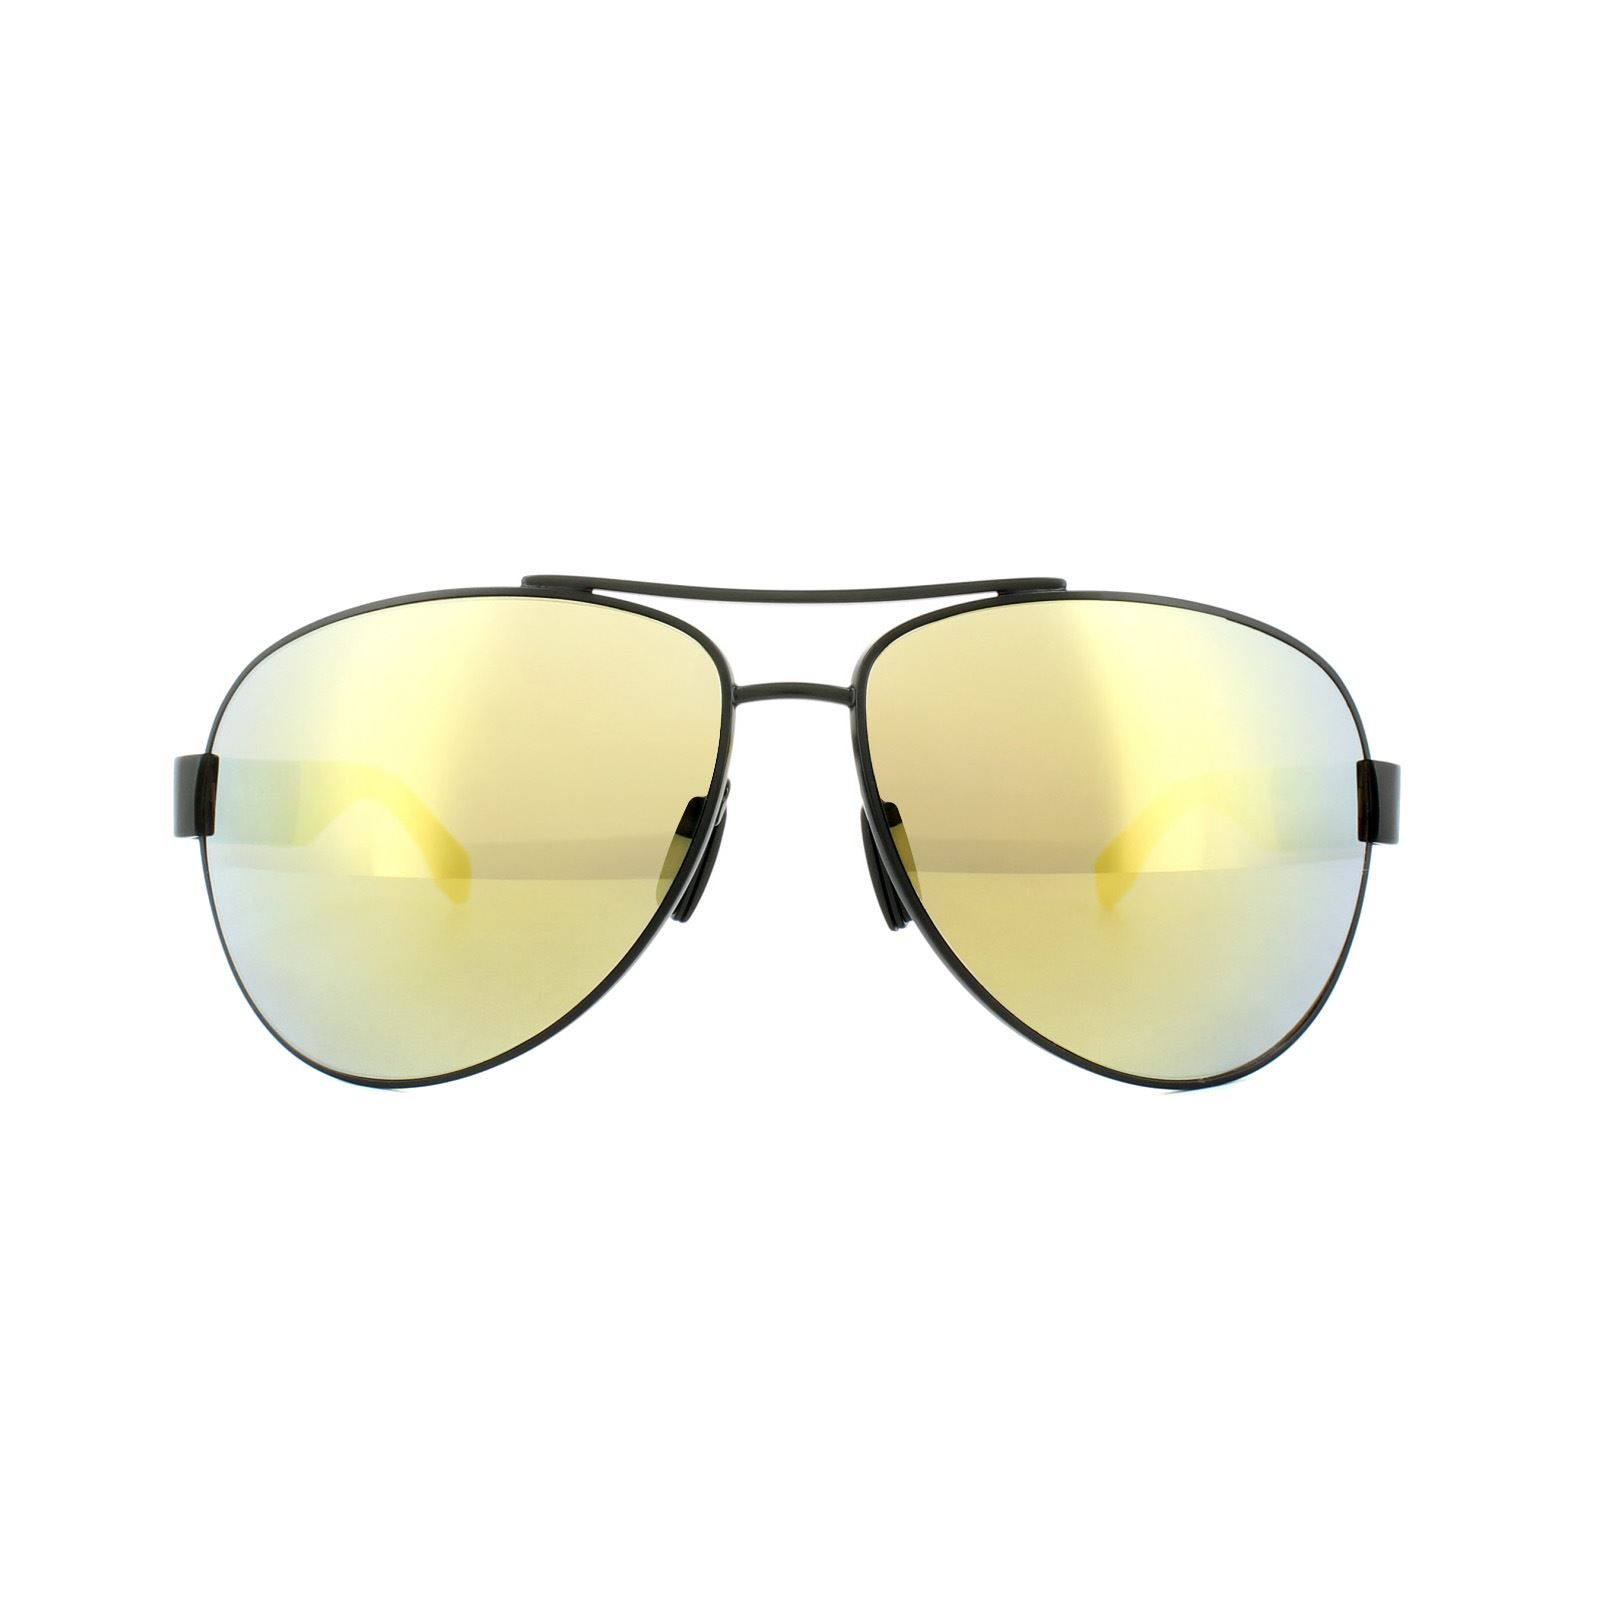 Hugo Boss Sunglasses 0915 1Y3 C4 Matt Black & Yellow Yellow Mirror Polarized